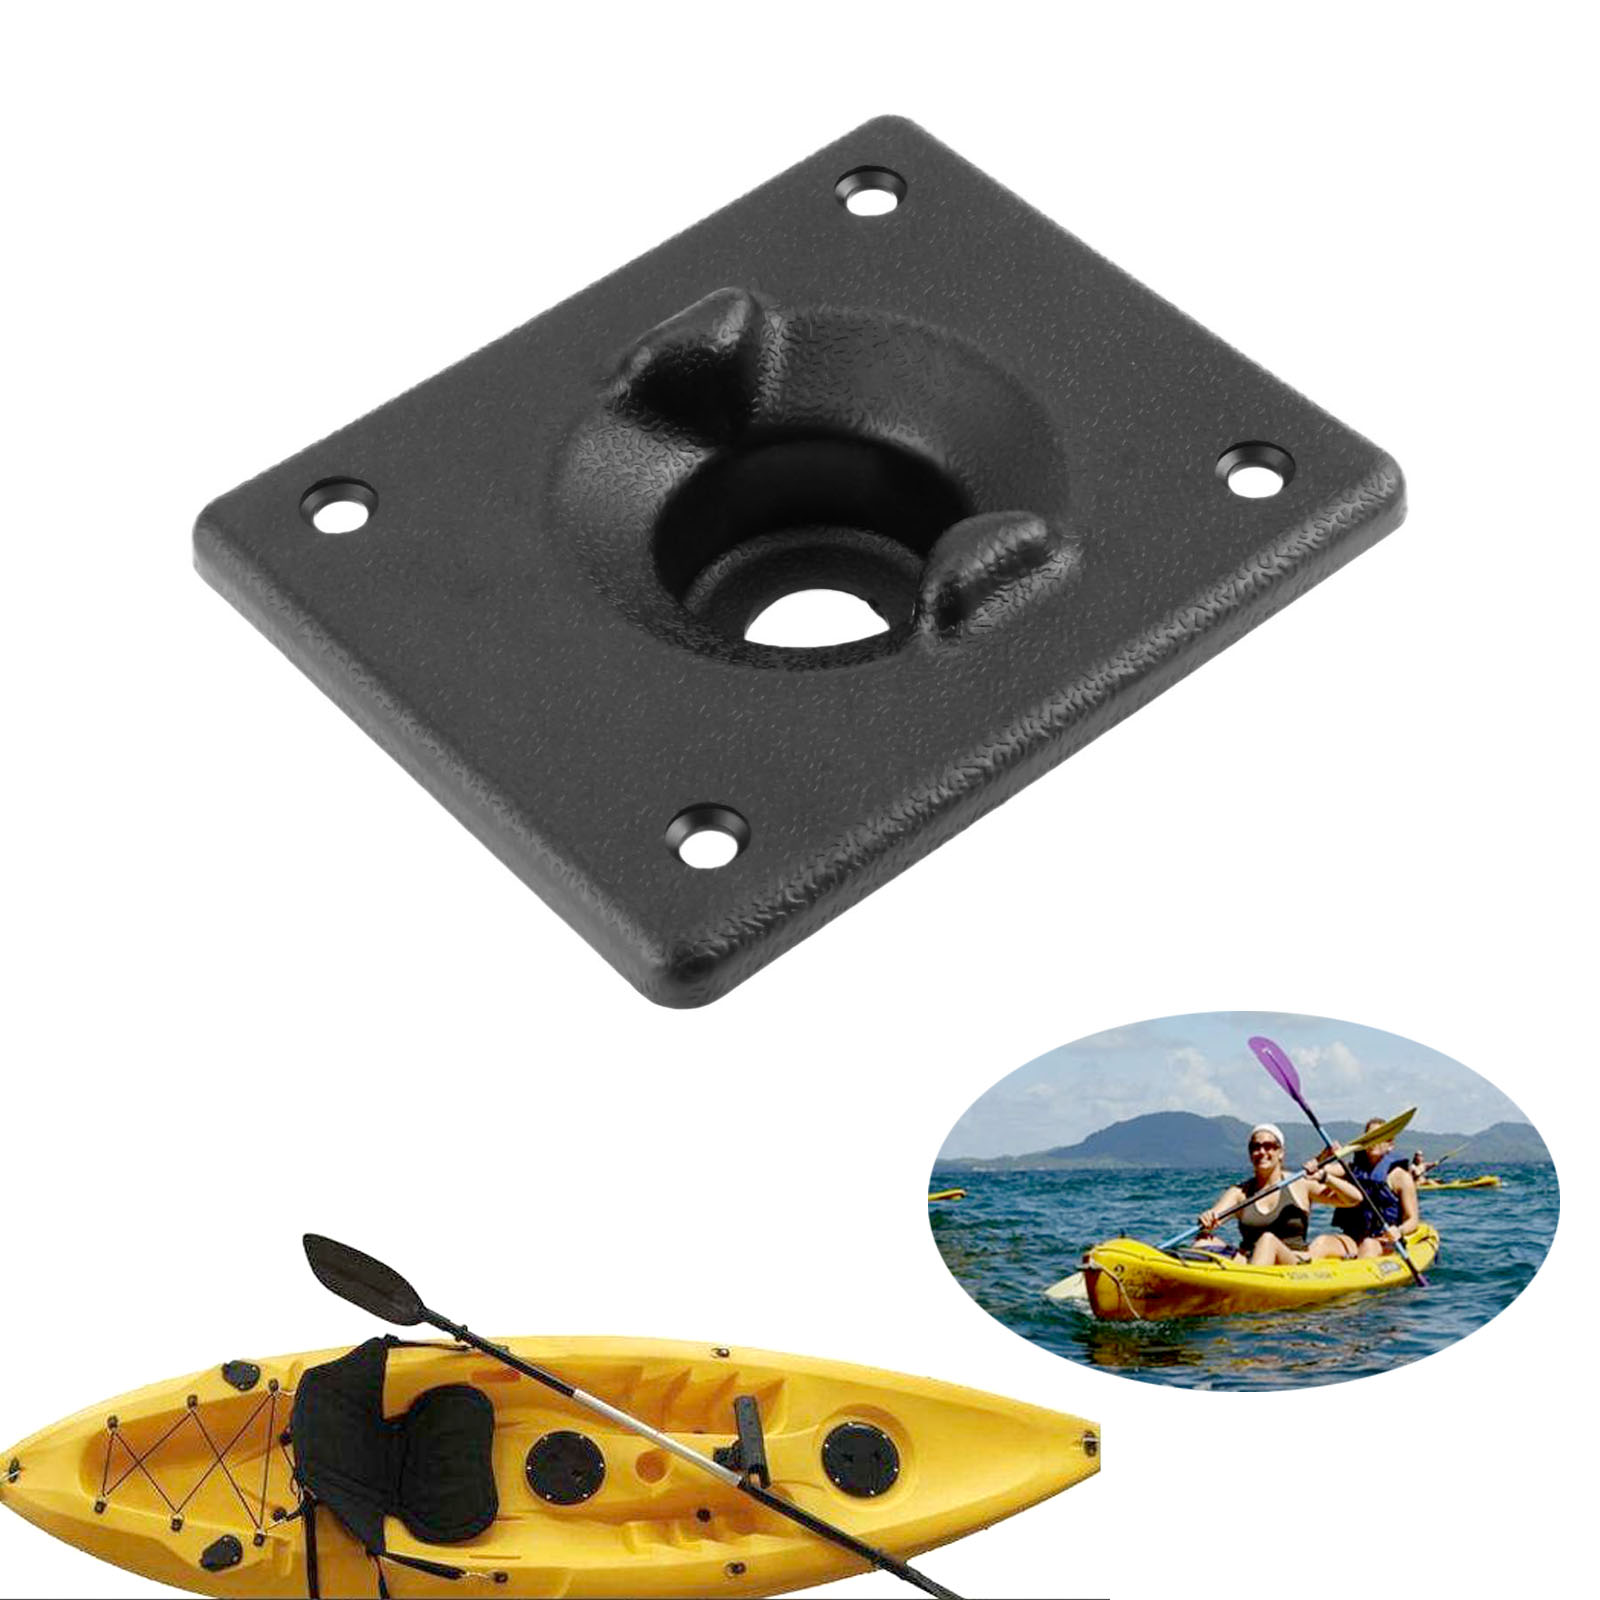 Strong Stainless Steel Kayak Canoe Boat Rudder Control System Mount Base Kit